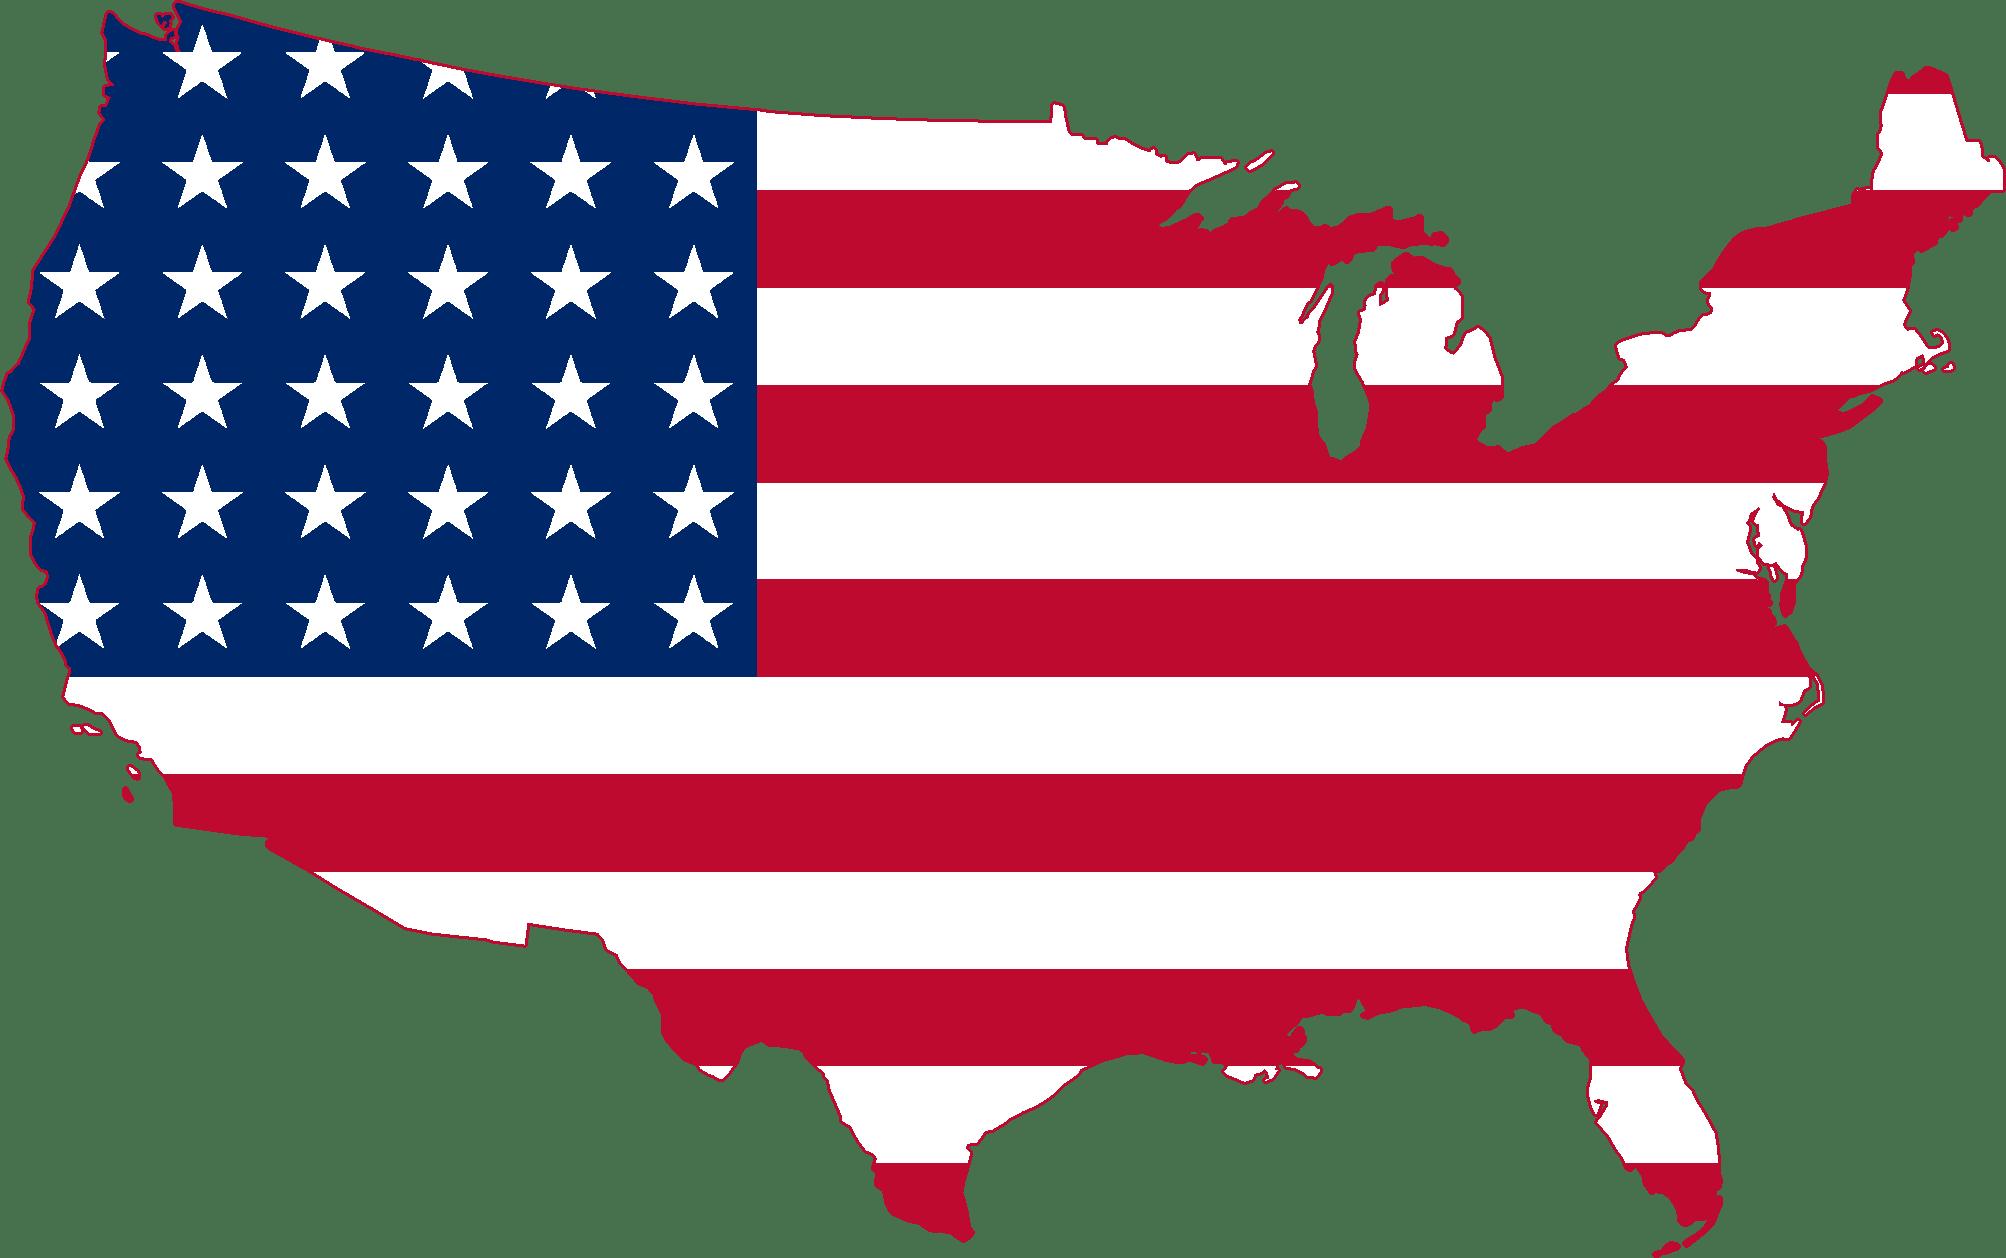 Buy Leads USA, Web Design Leads USA - Leadpot